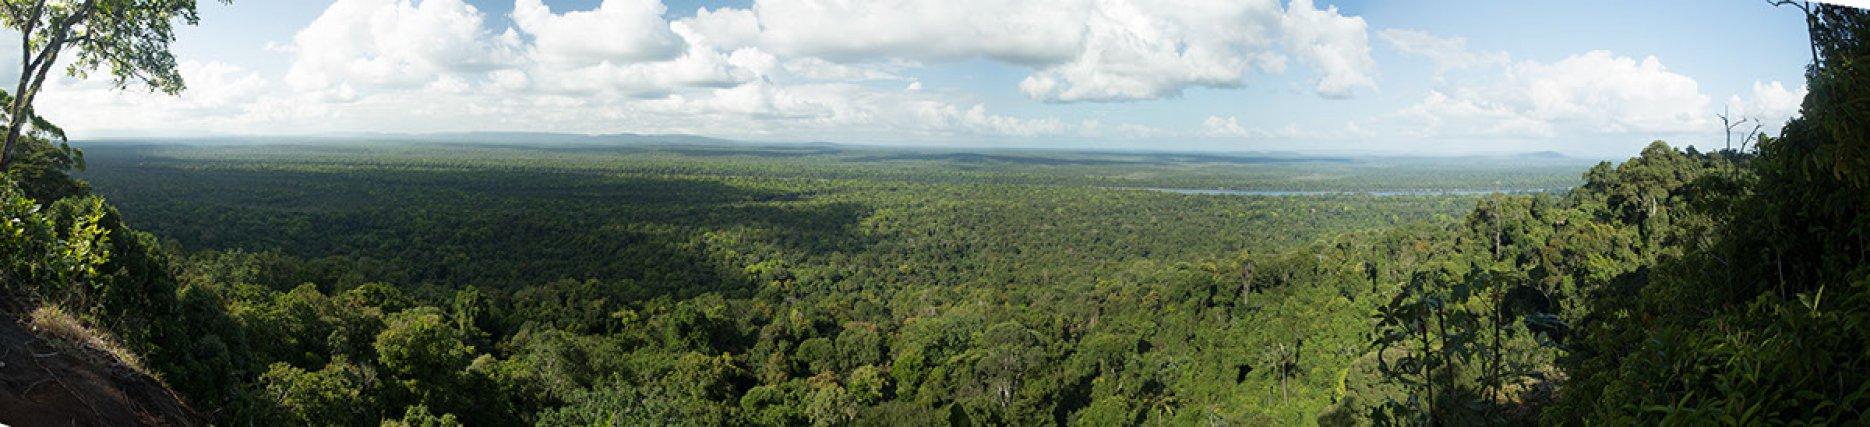 Panorama des montagne Tortues à Iwokrama